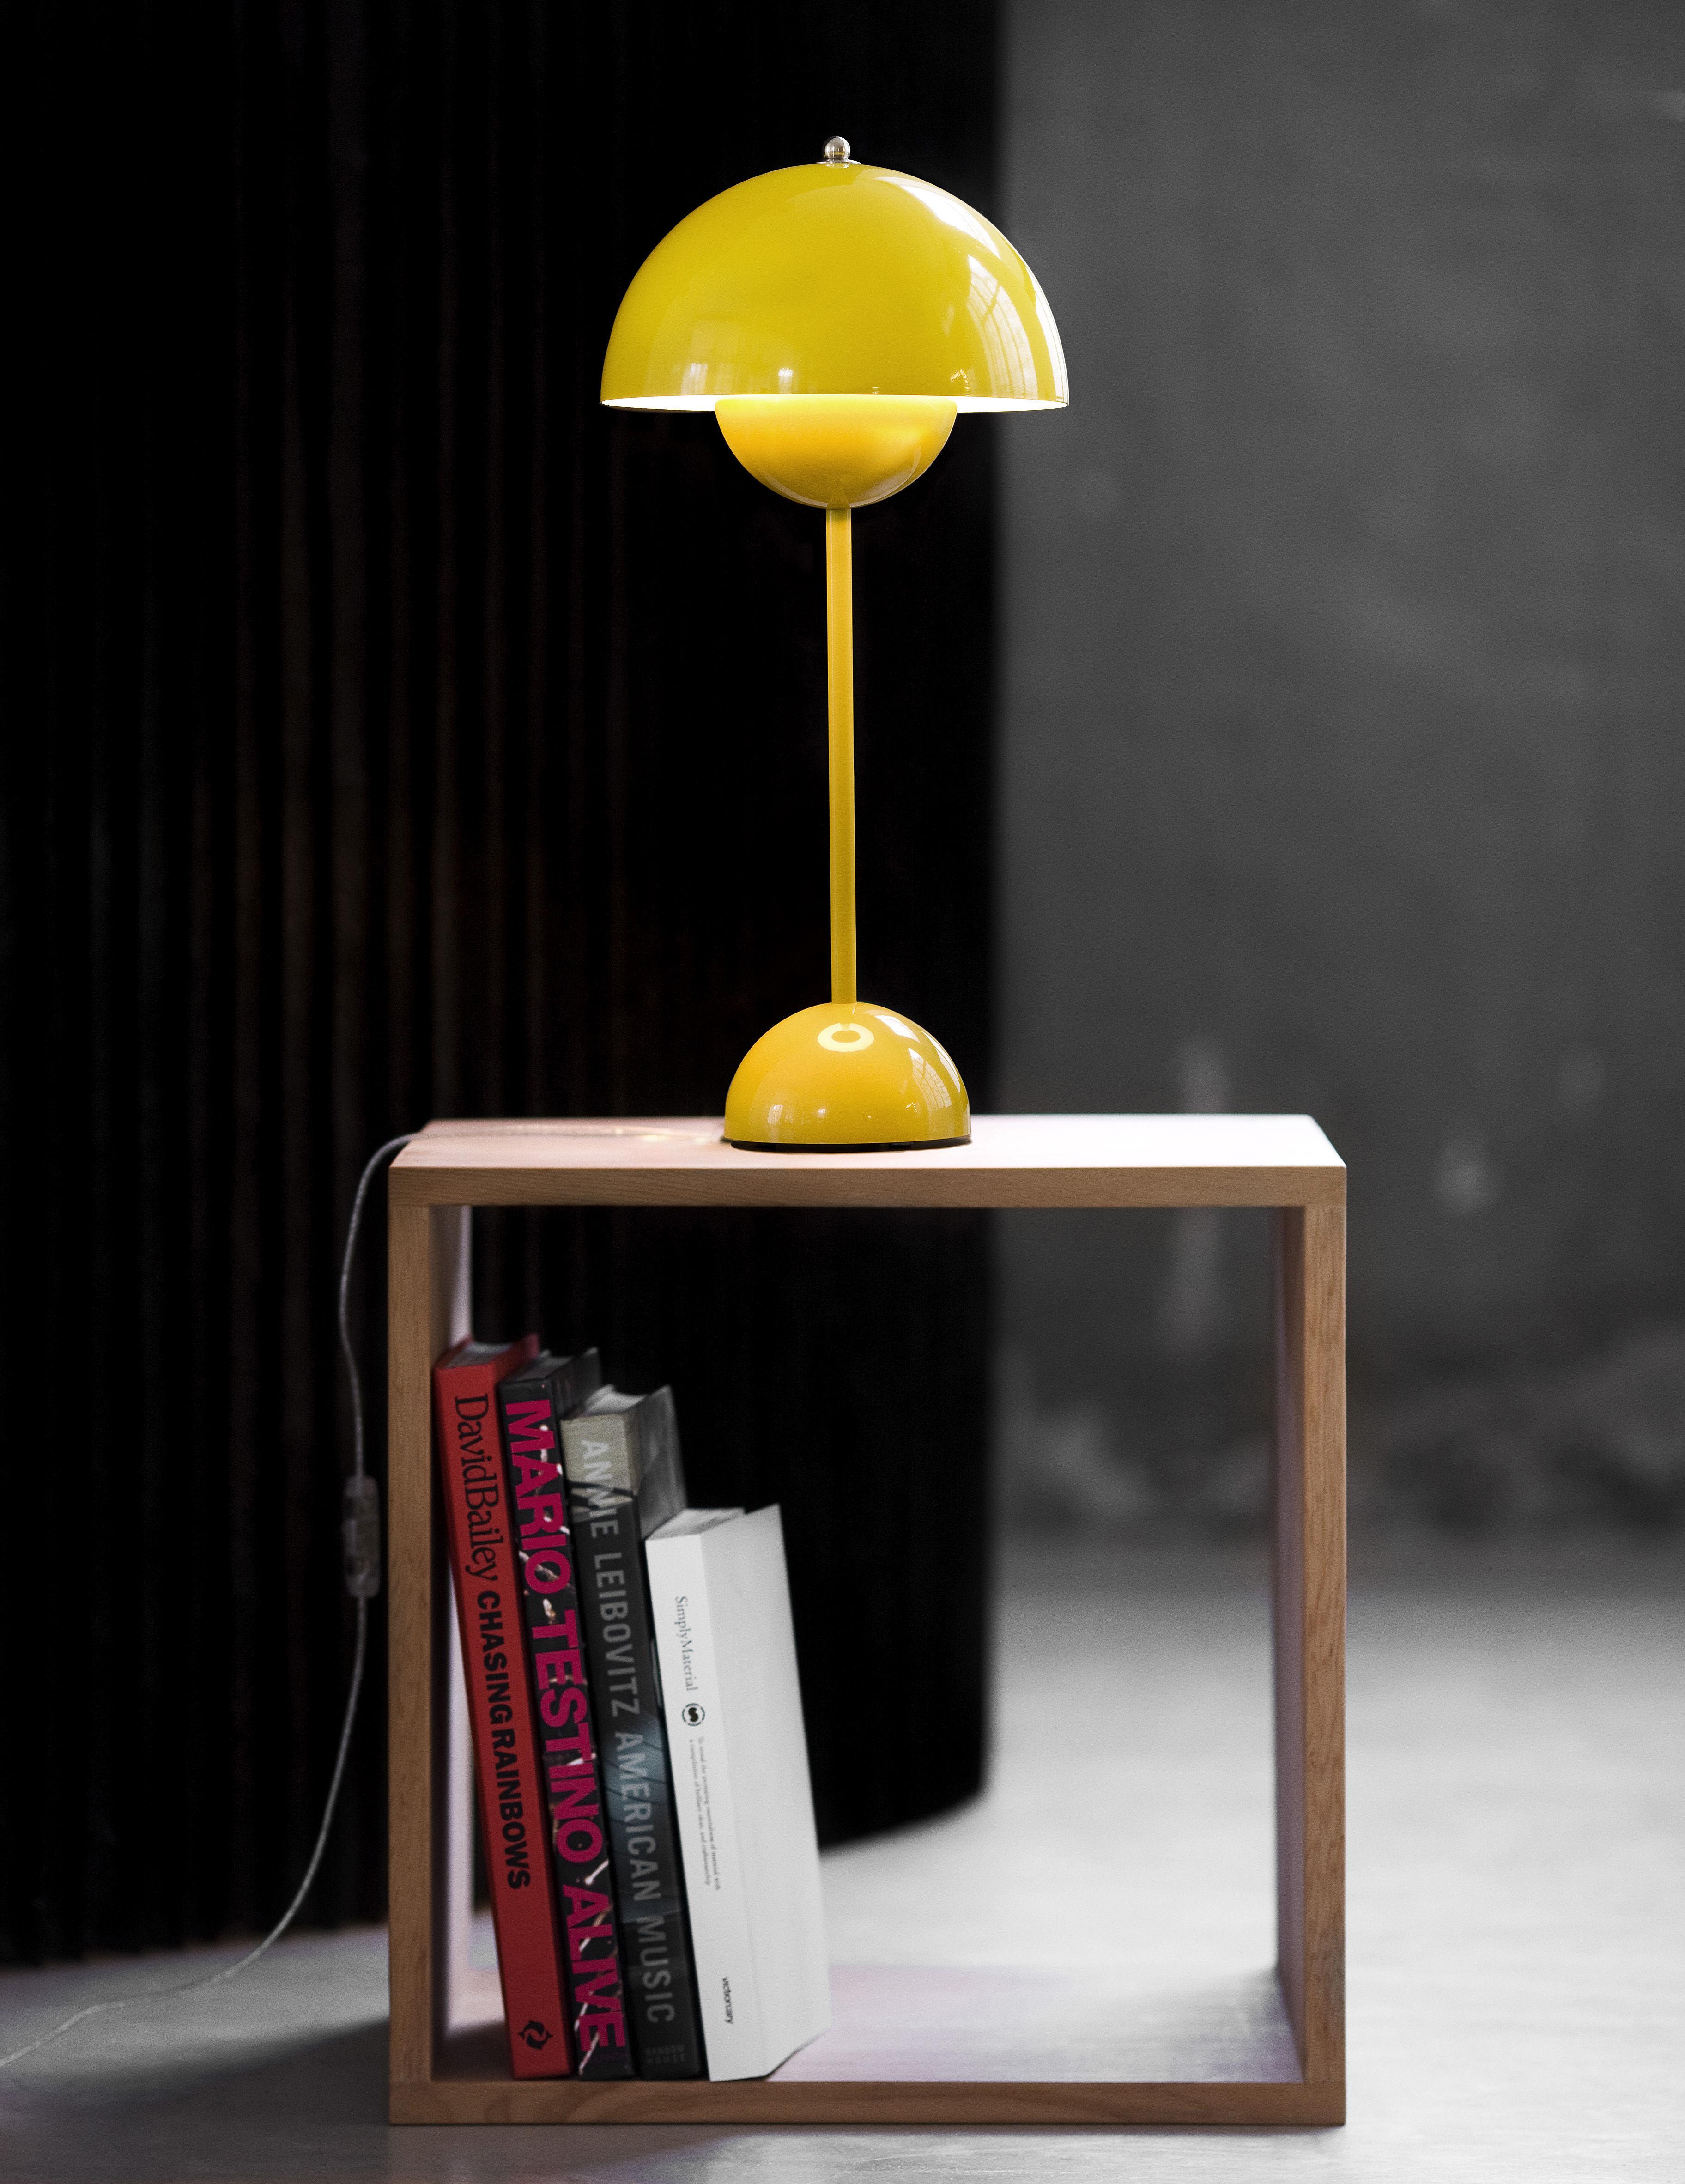 lampe de table flowerpot vp3 h 49 cm jaune and tradition. Black Bedroom Furniture Sets. Home Design Ideas